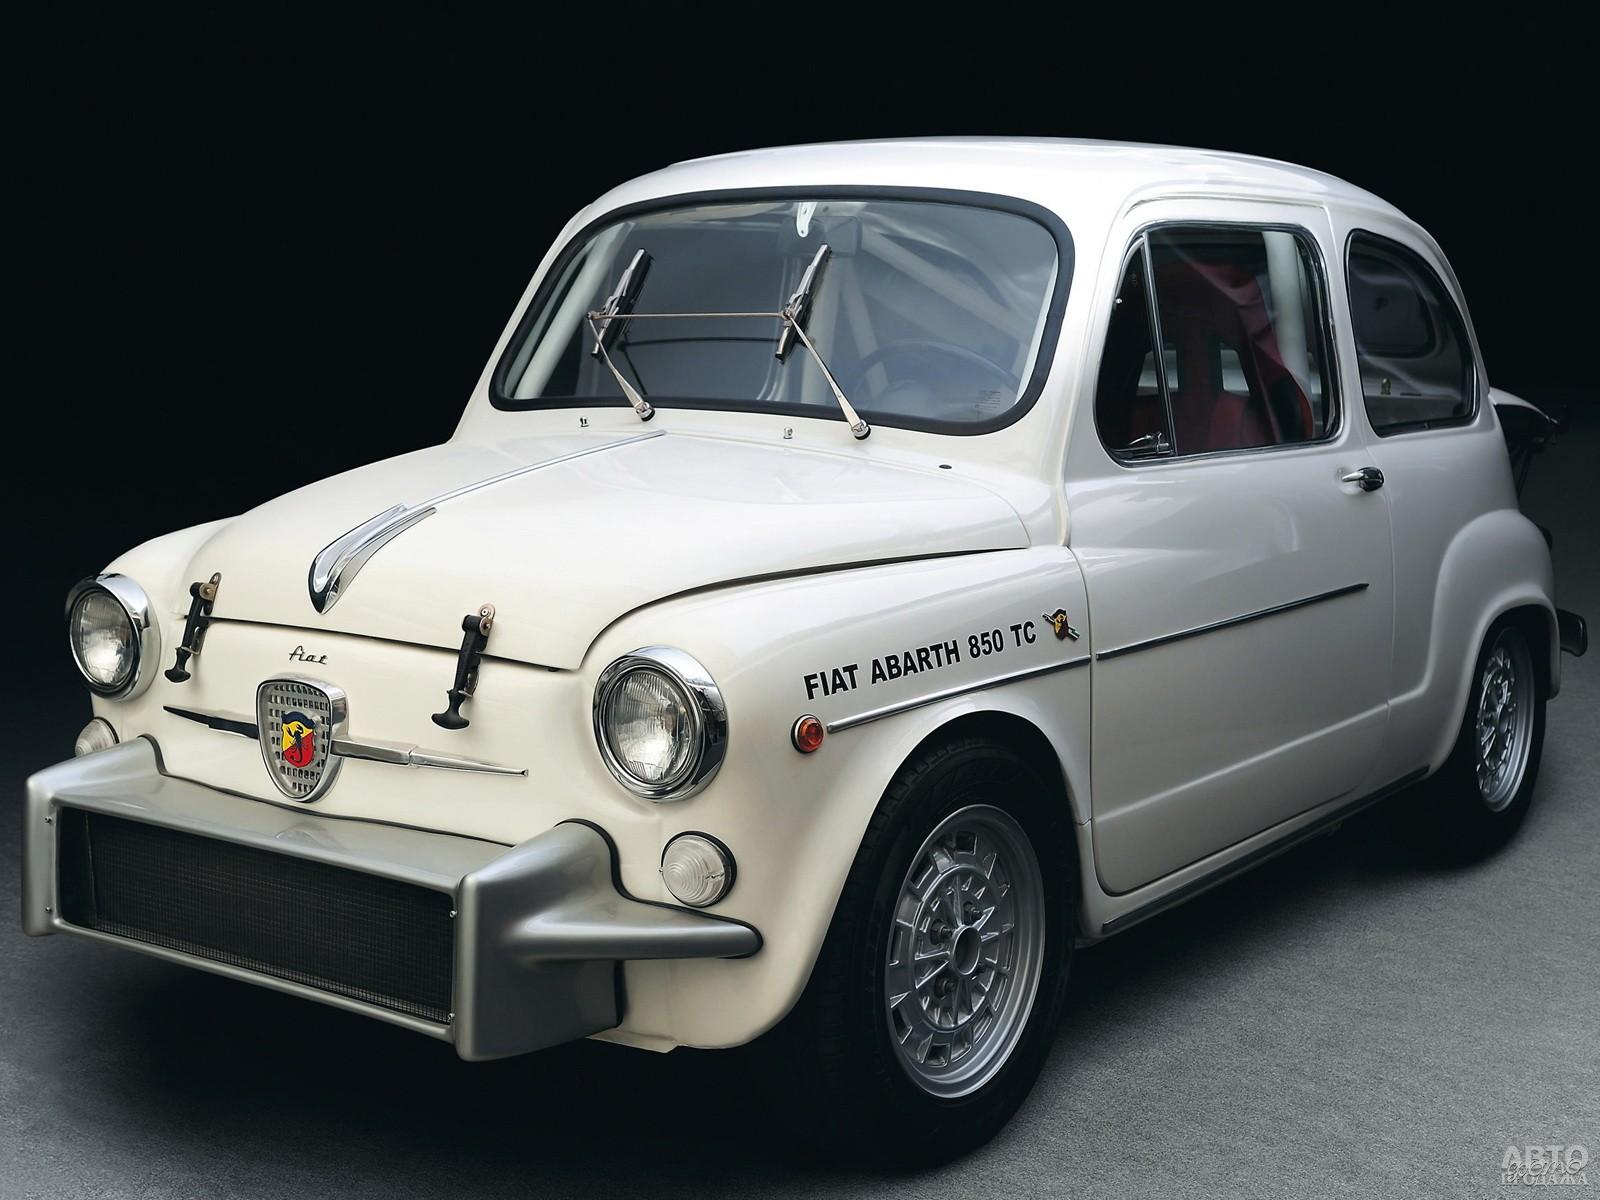 Fiat Abarth 850 TC Corsa 1962 года